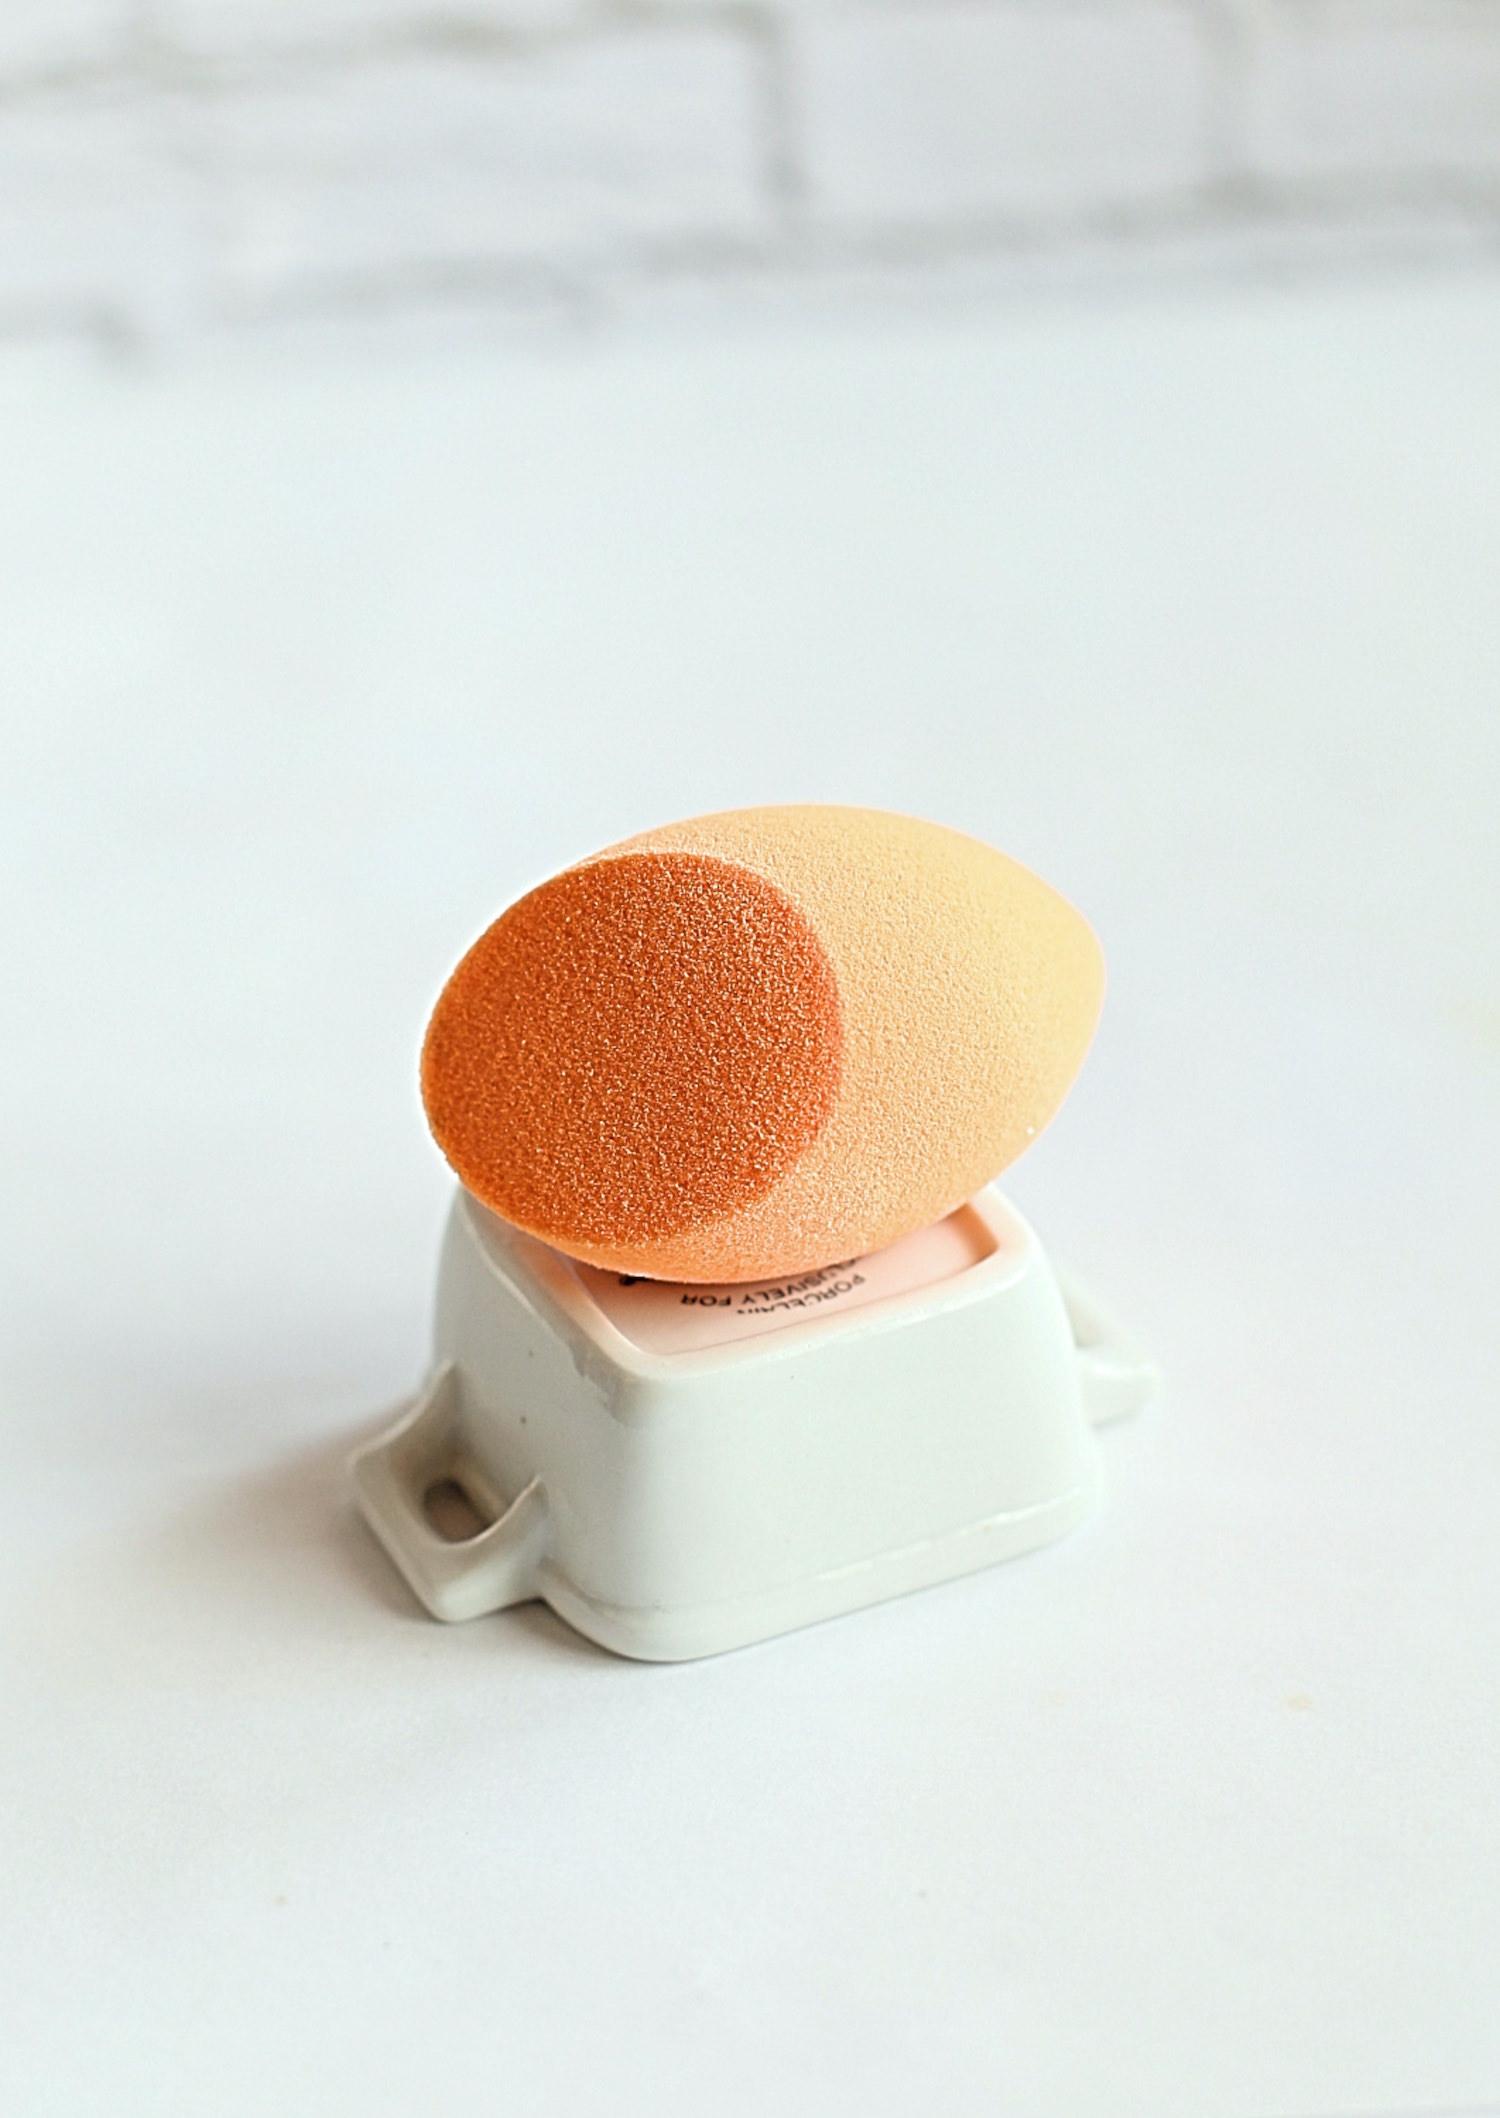 My Favorite Drugstore Makeup Products - Real Techniques Makeup Sponge | TrufflesandTrends.com